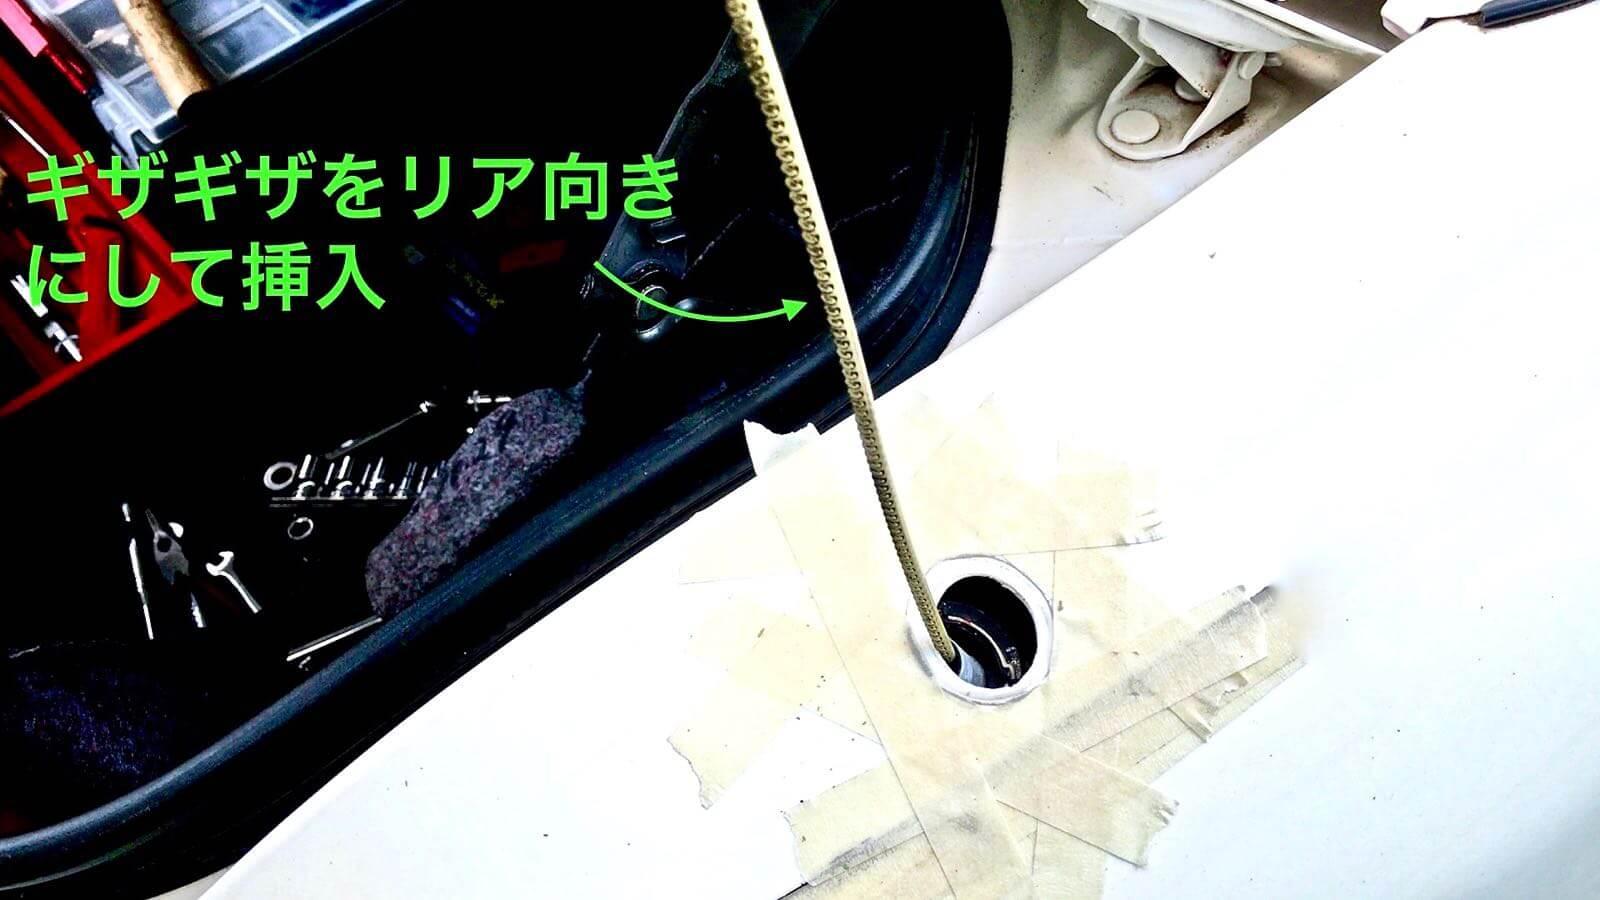 0150 MR2 Restore Plan  Part  23 Automatic antenna repair 19